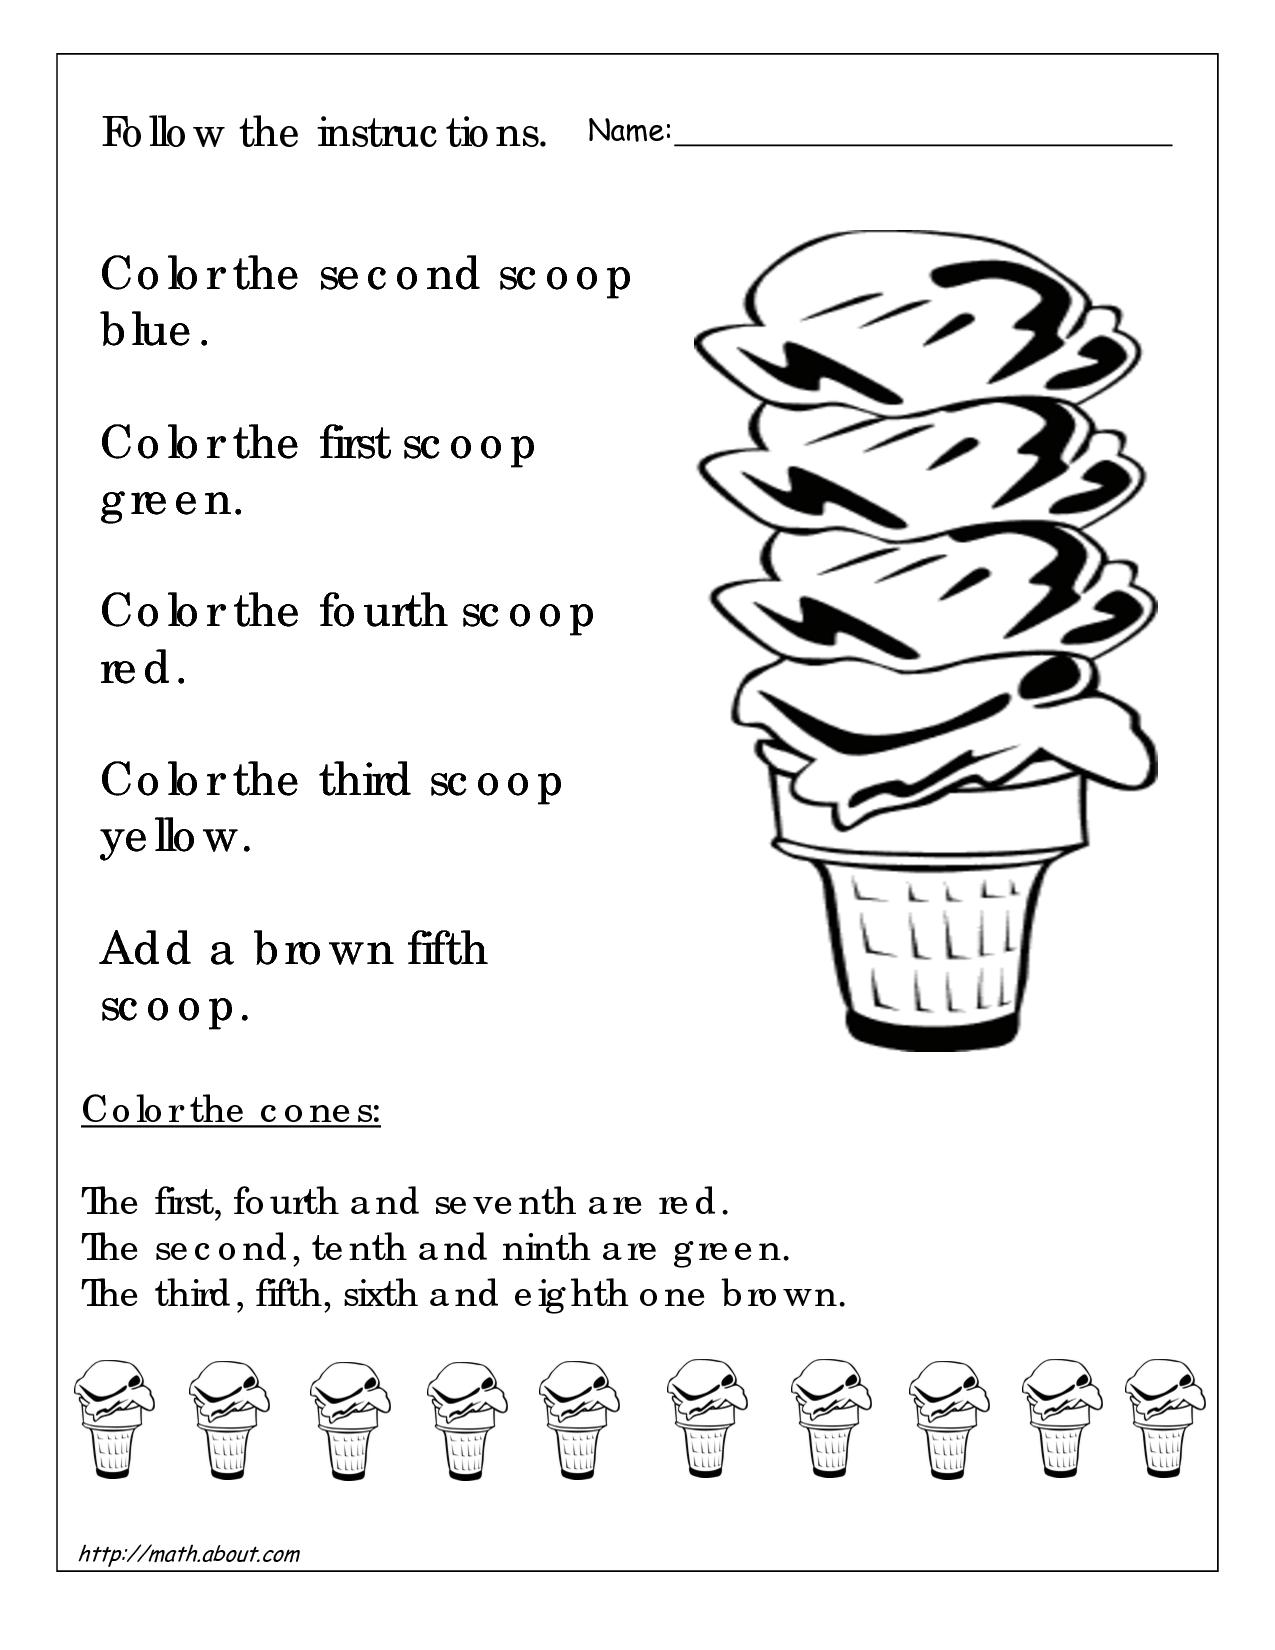 Math Worksheets For 3Rd Graders | 1St Grade Printable Worksheets For - Printable Puzzles For 3Rd Grade